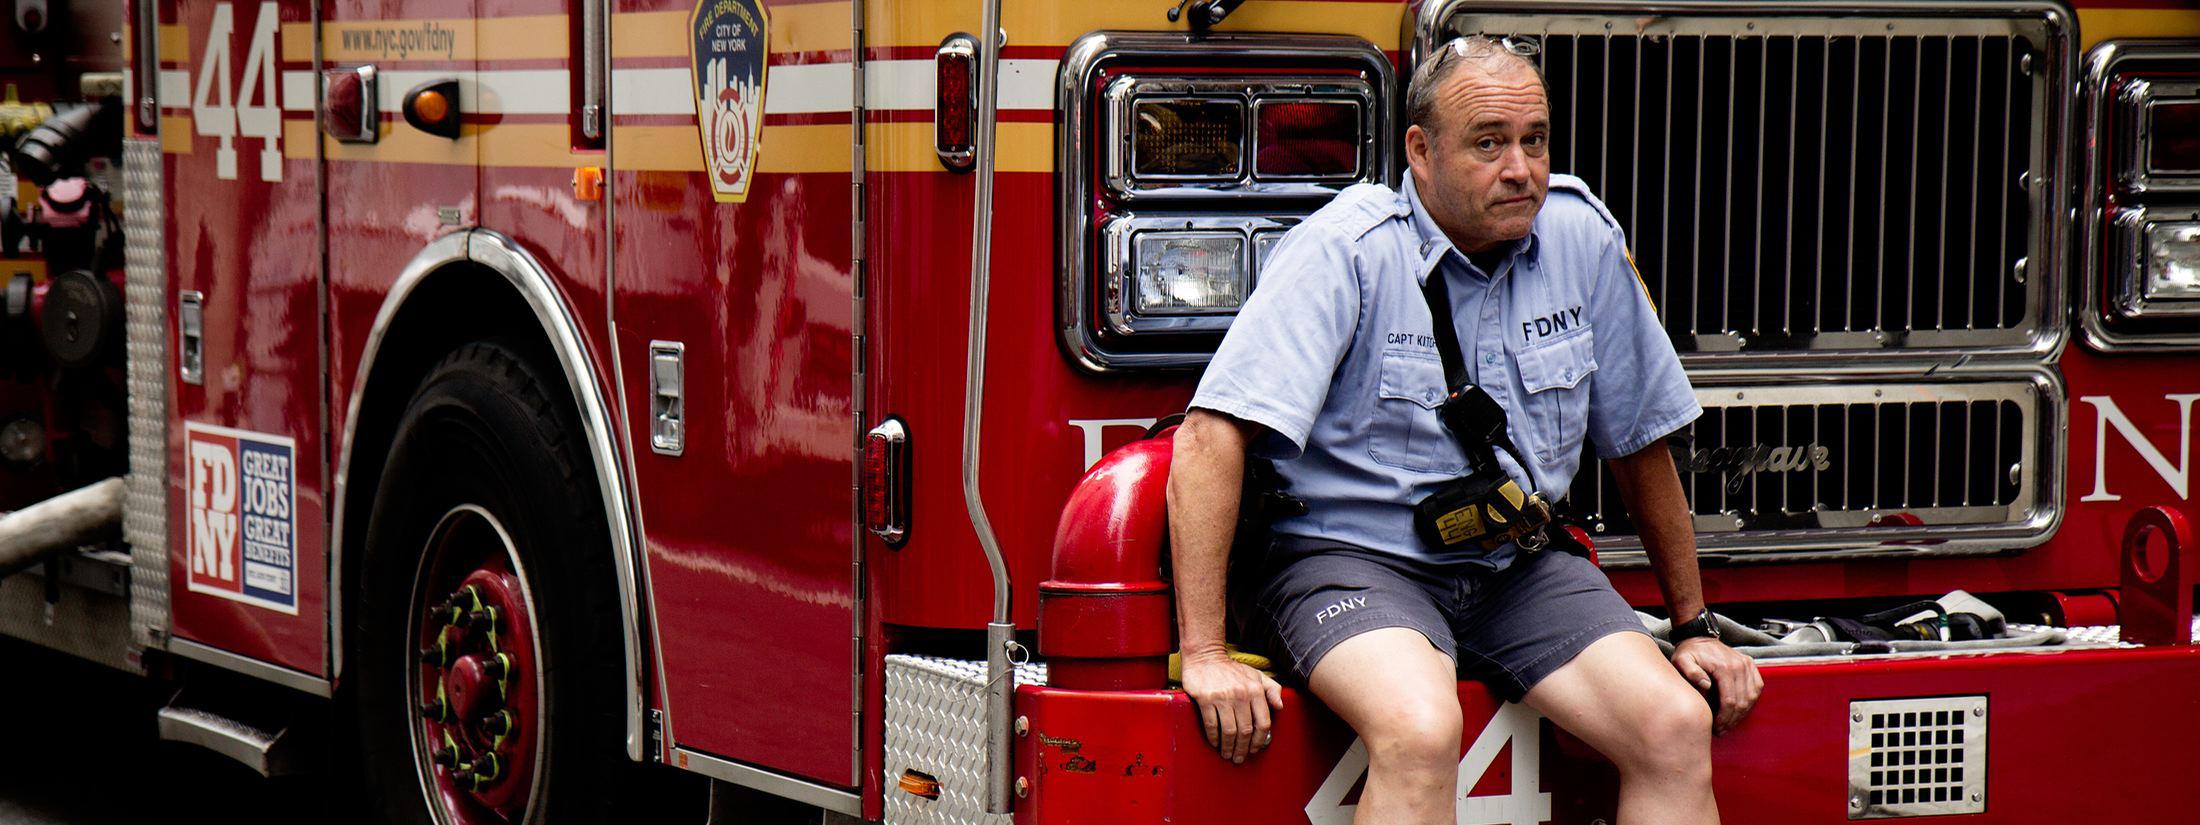 brandweerman op bumper